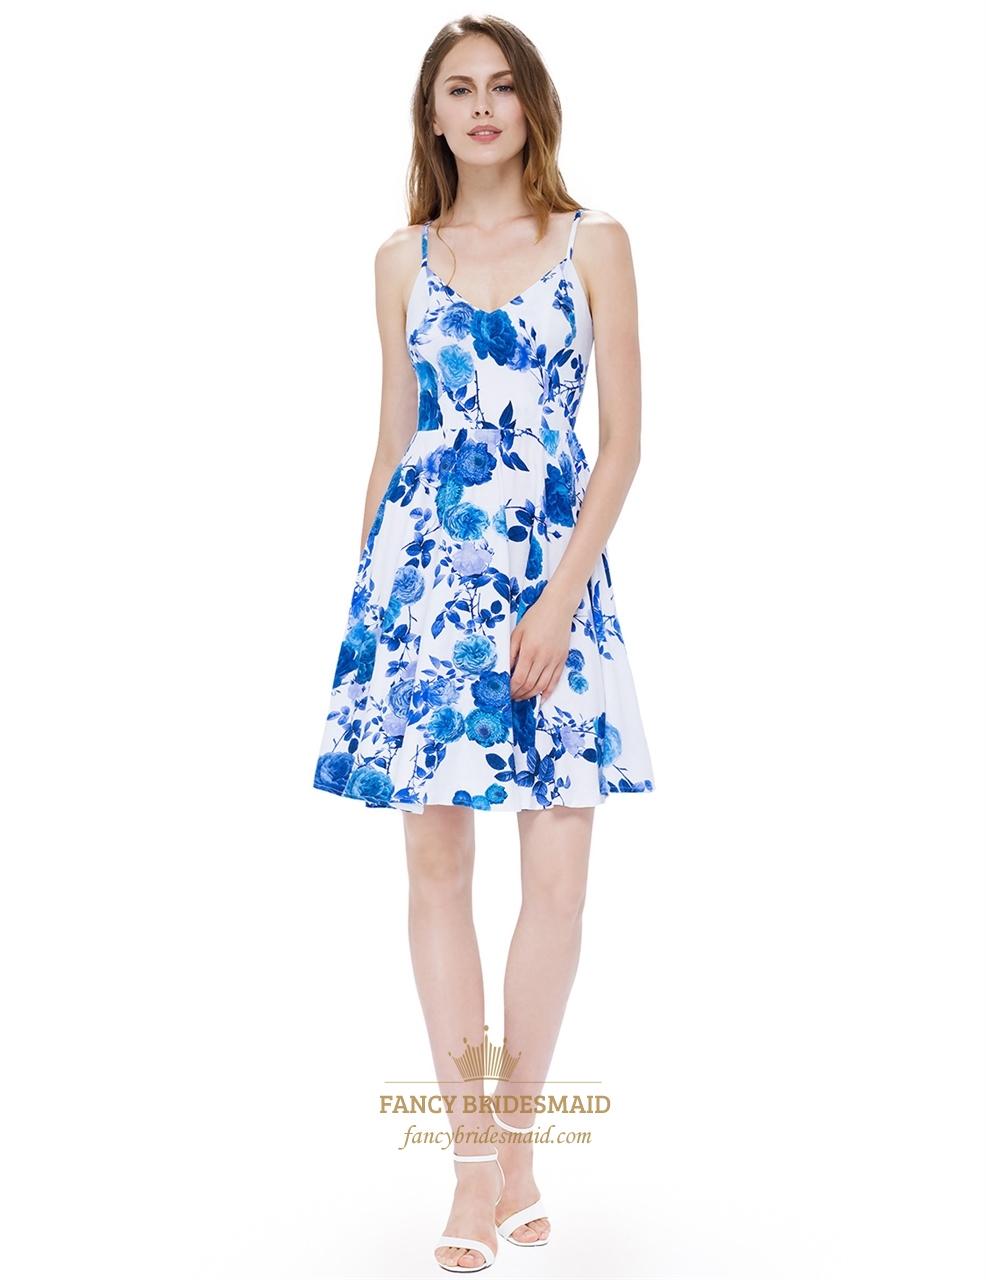 White Spaghetti Strap Sleeveless A Line Causal Dress With